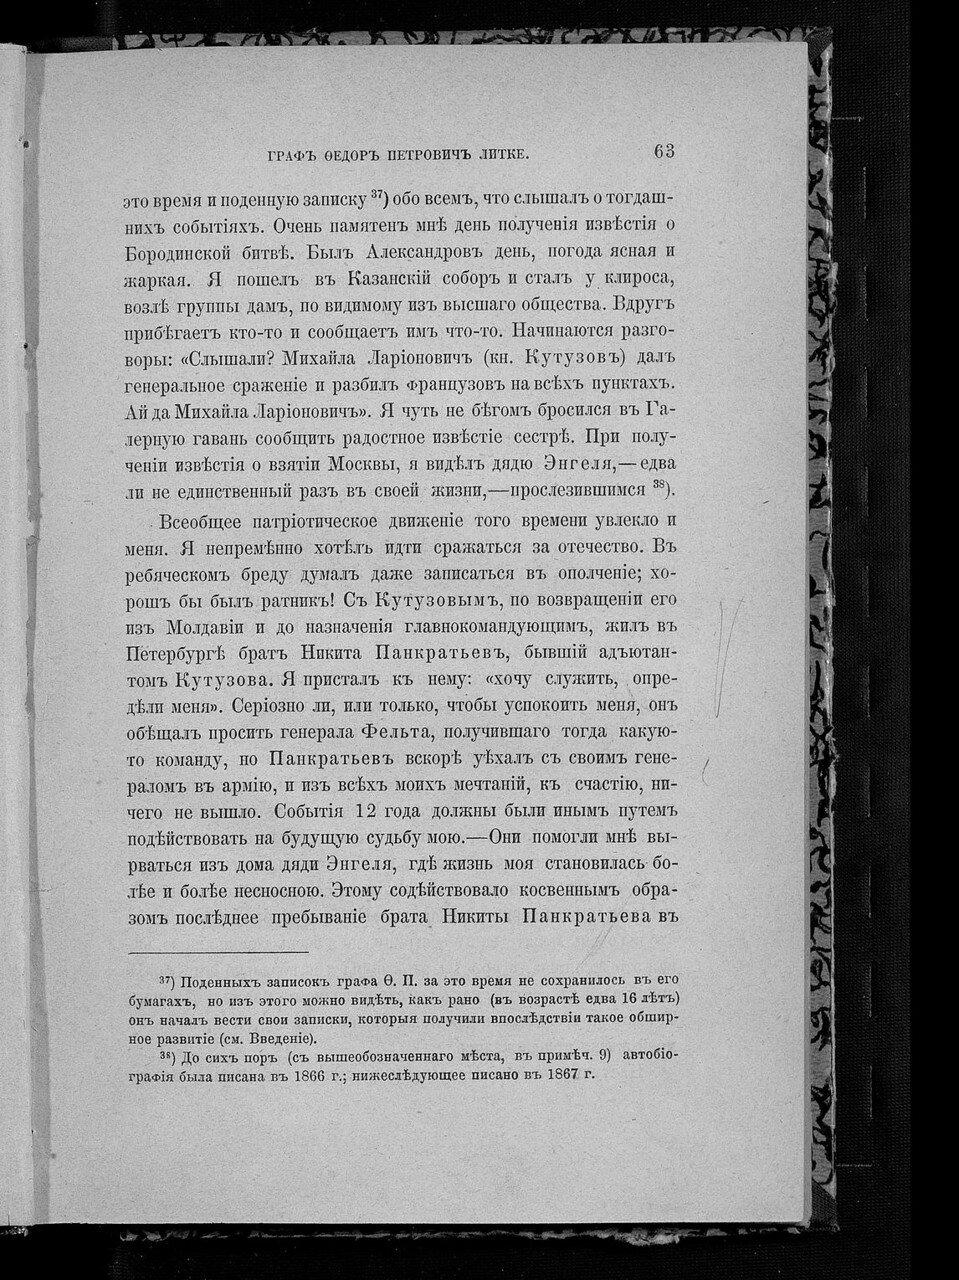 https://img-fotki.yandex.ru/get/893194/199368979.d4/0_21ddde_3195bed7_XXXL.jpg